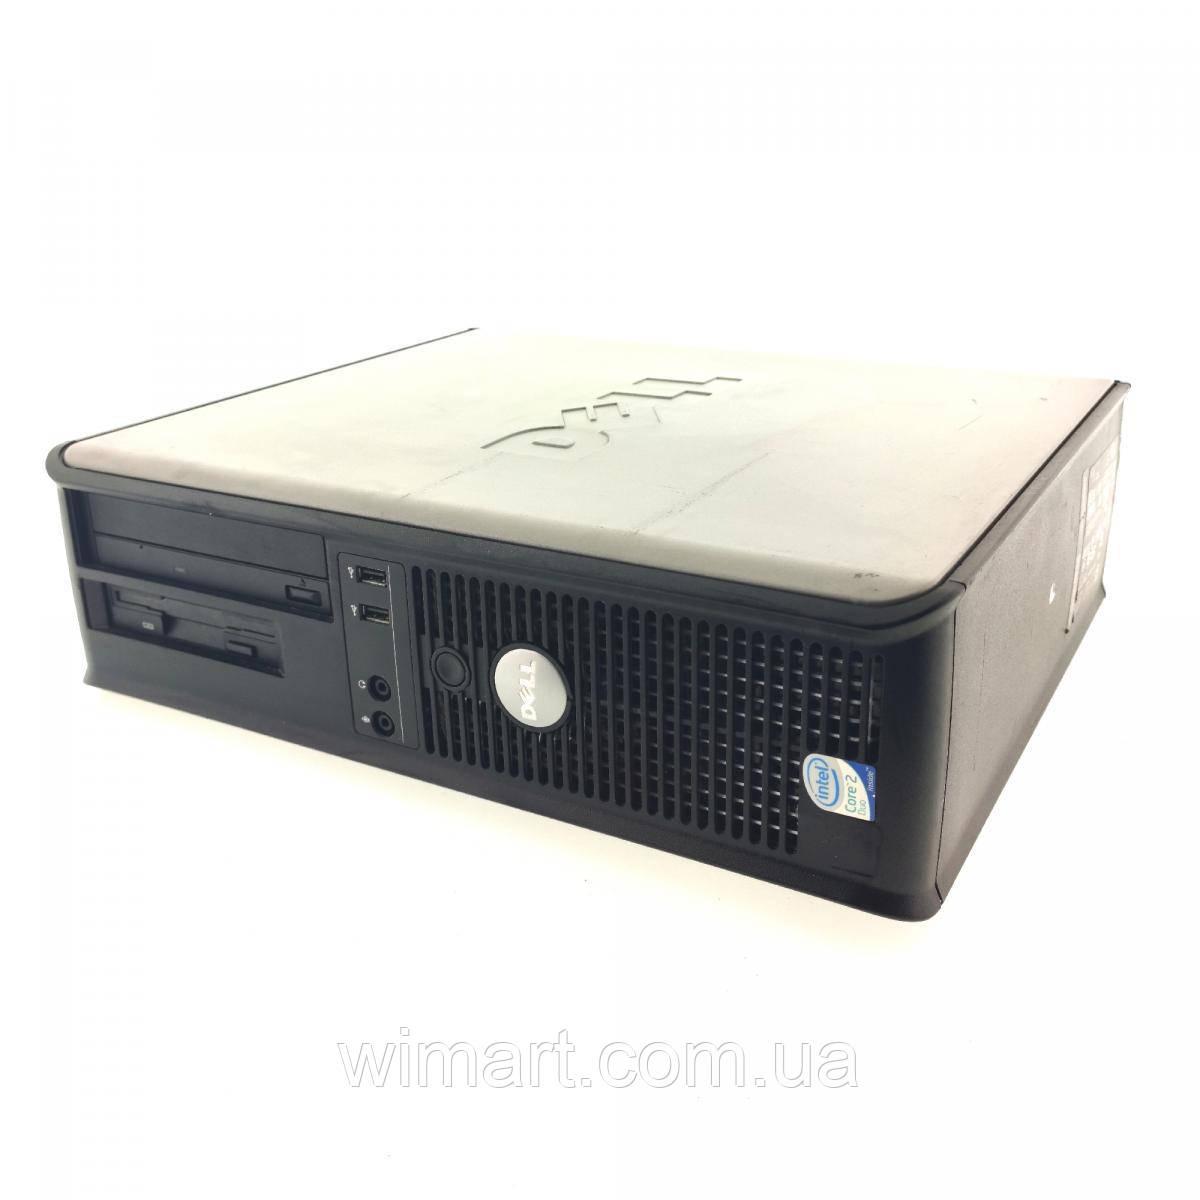 Б/У Системный блок Dell Optiplex 745 Desktop Intel Dual Core E6300 2GB DDR2 noHDD noOS